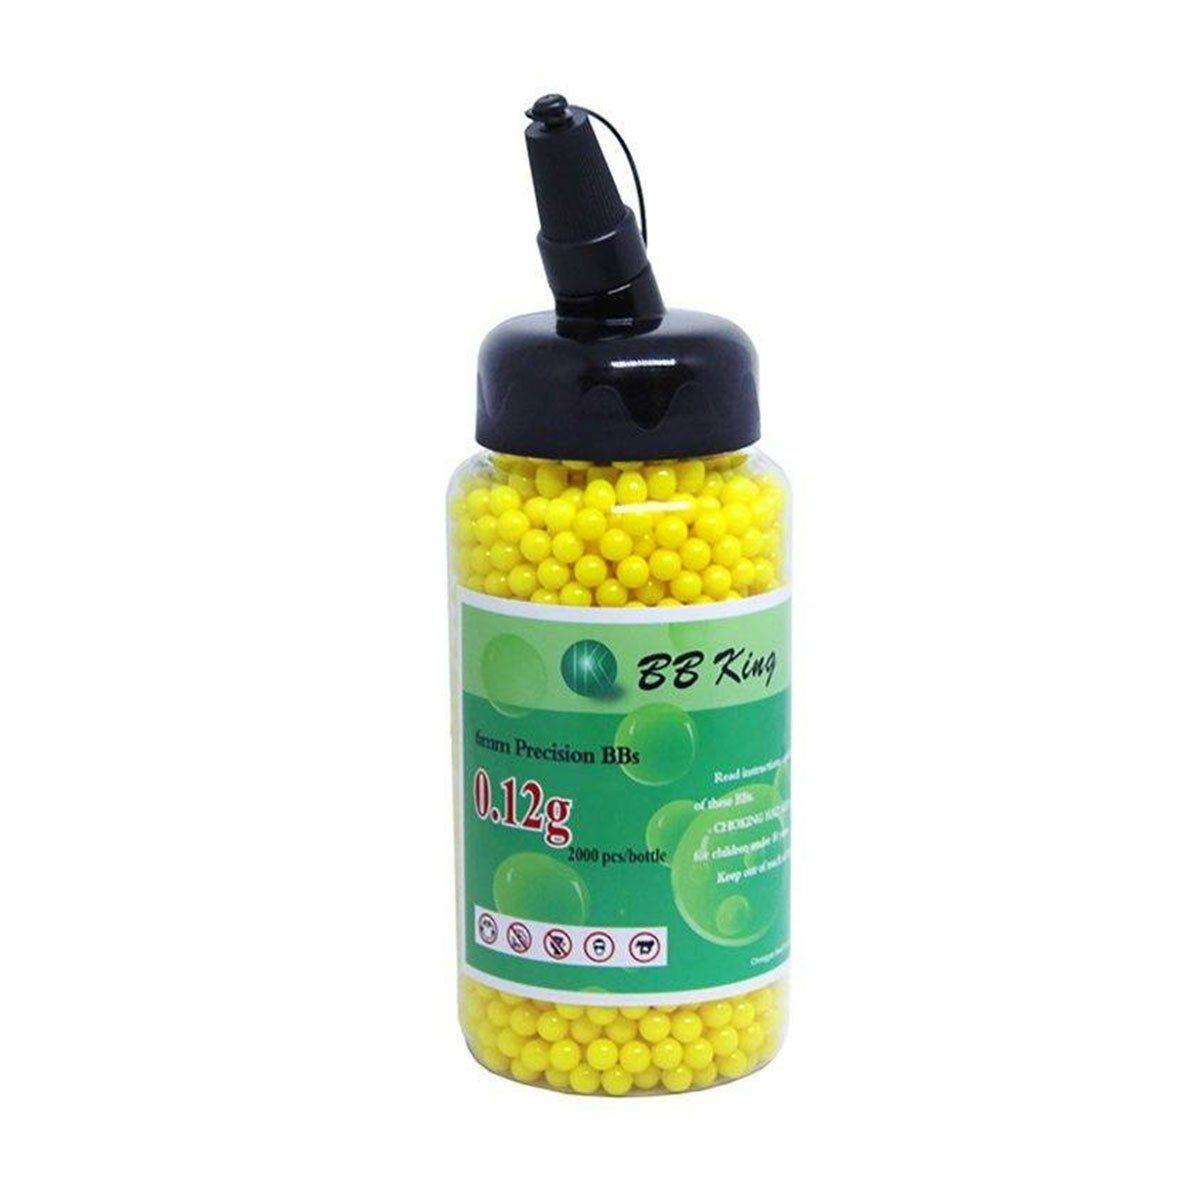 Esferas Plásticas BBs Airsoft BB King 0,12g Amarela 2000un